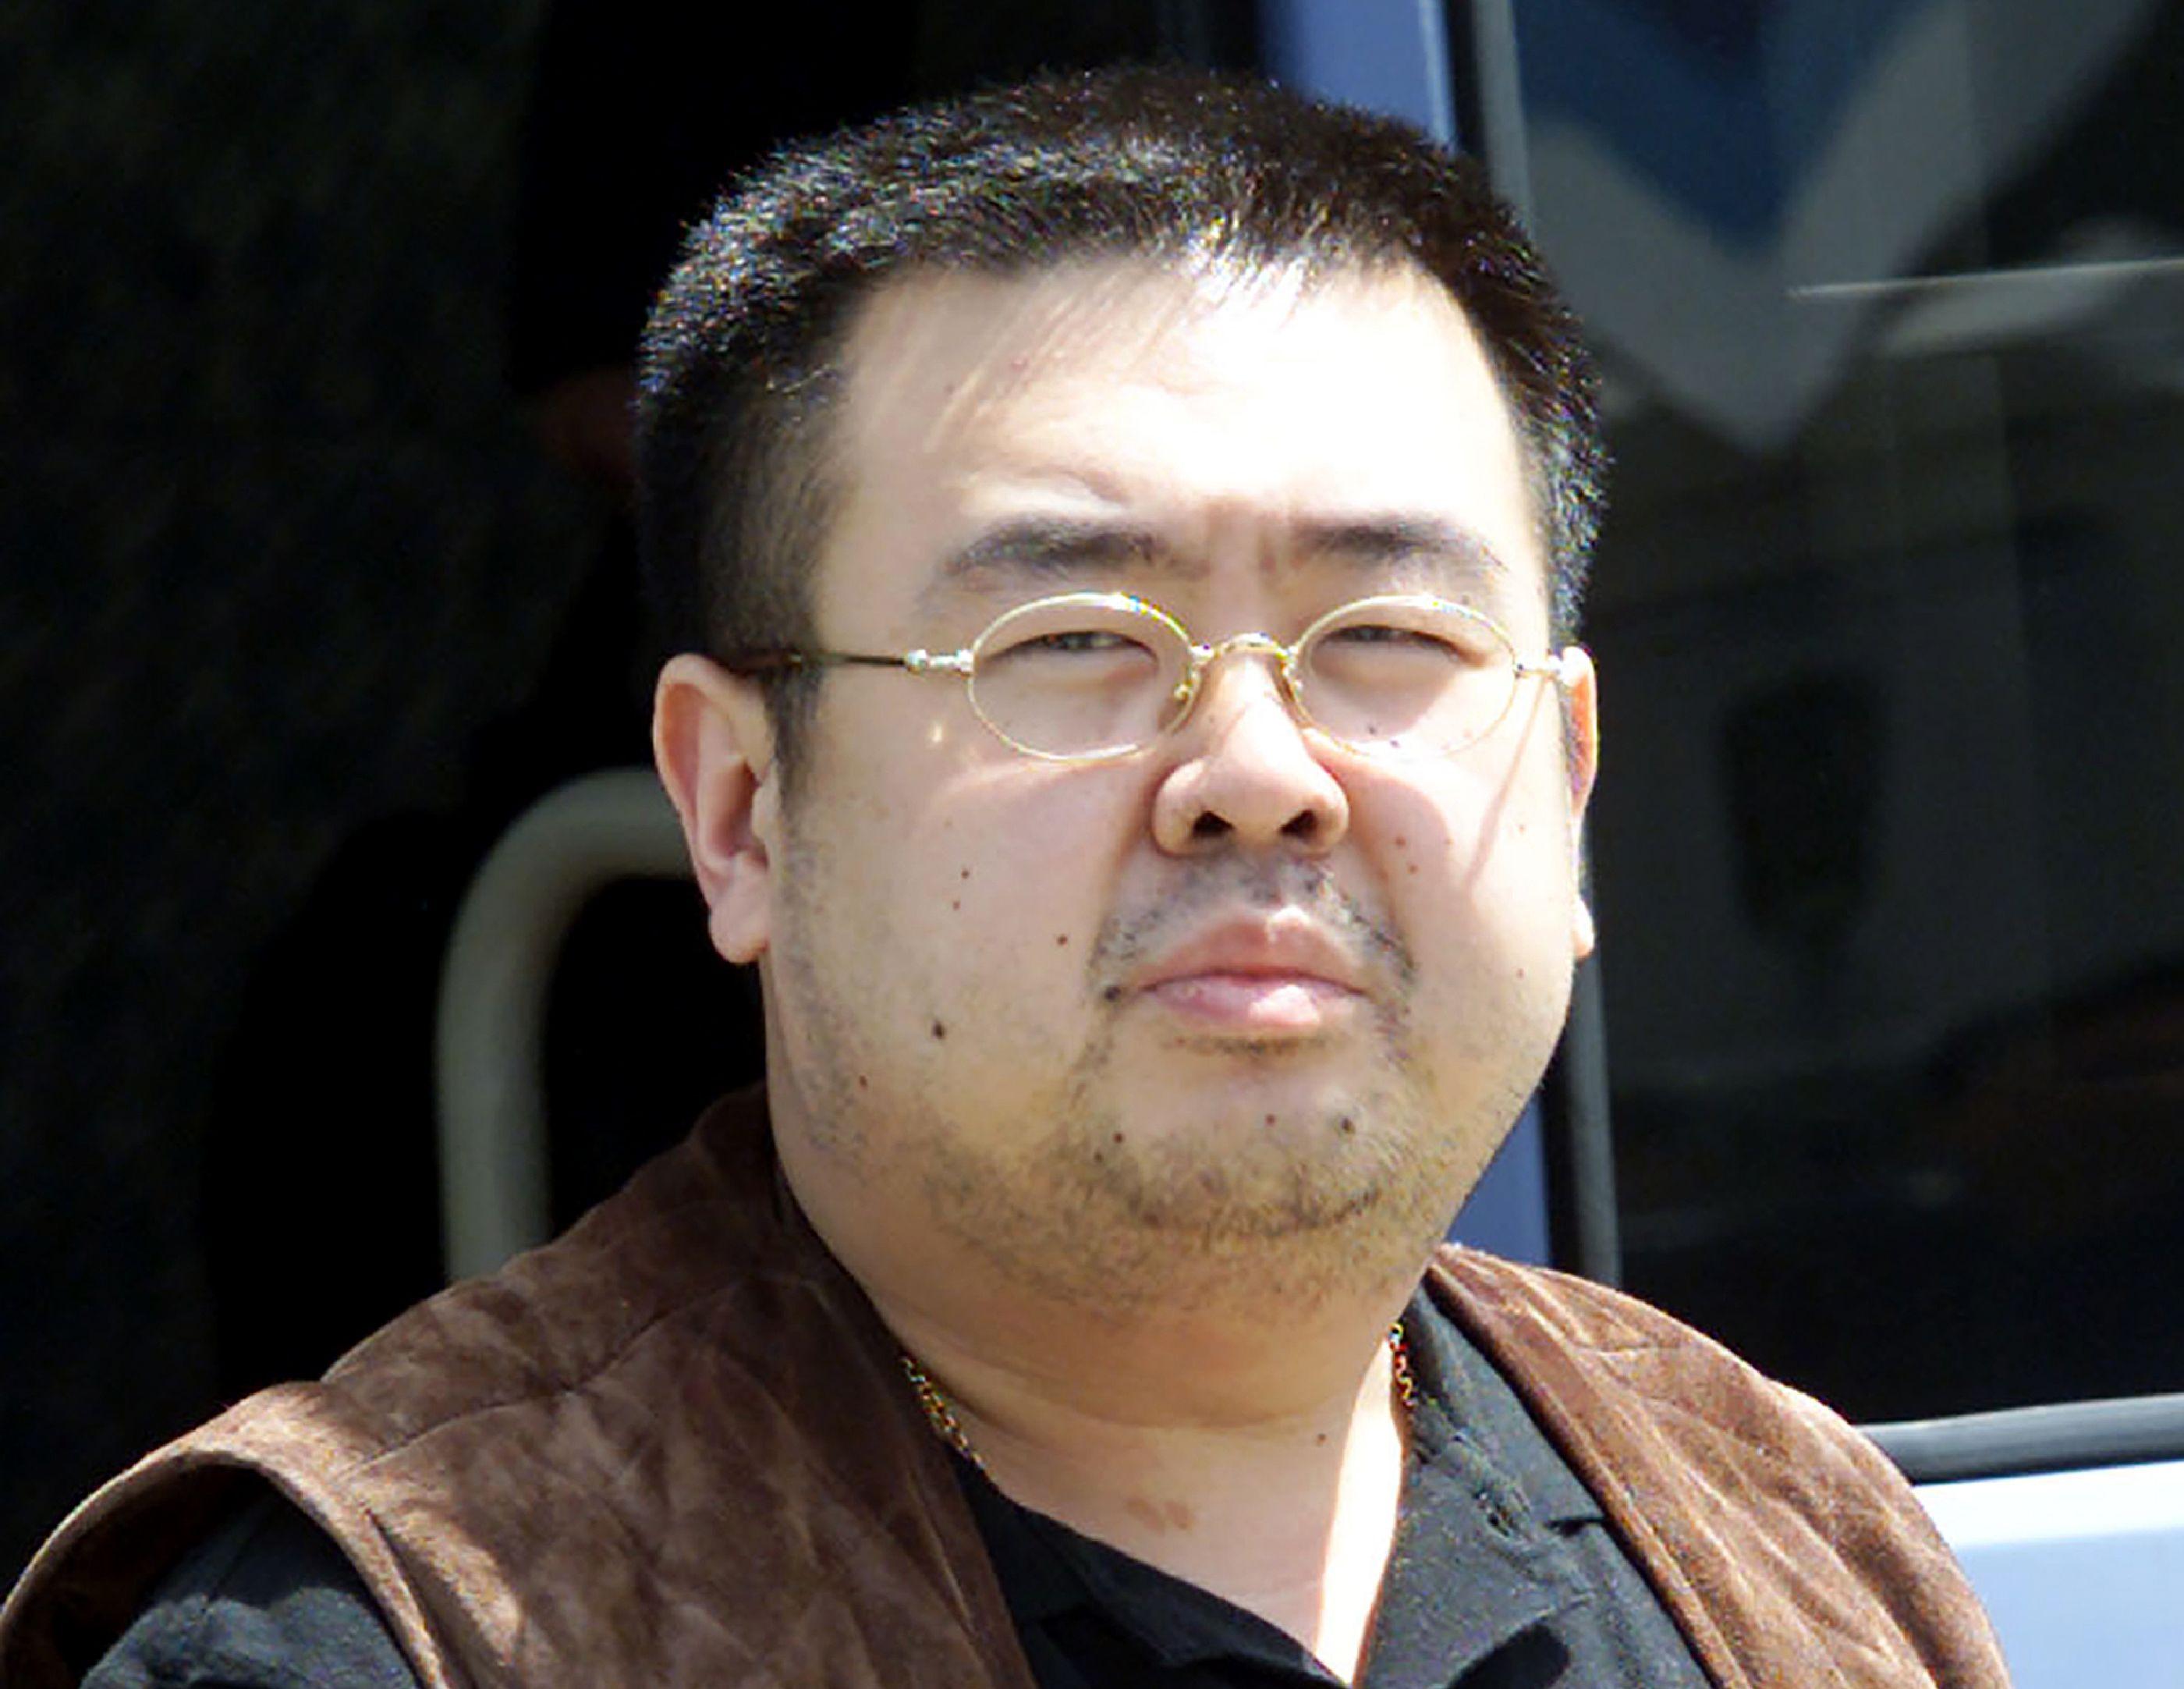 Women Plead not Guilty to Murdering North Korea Leader's Half-Brother